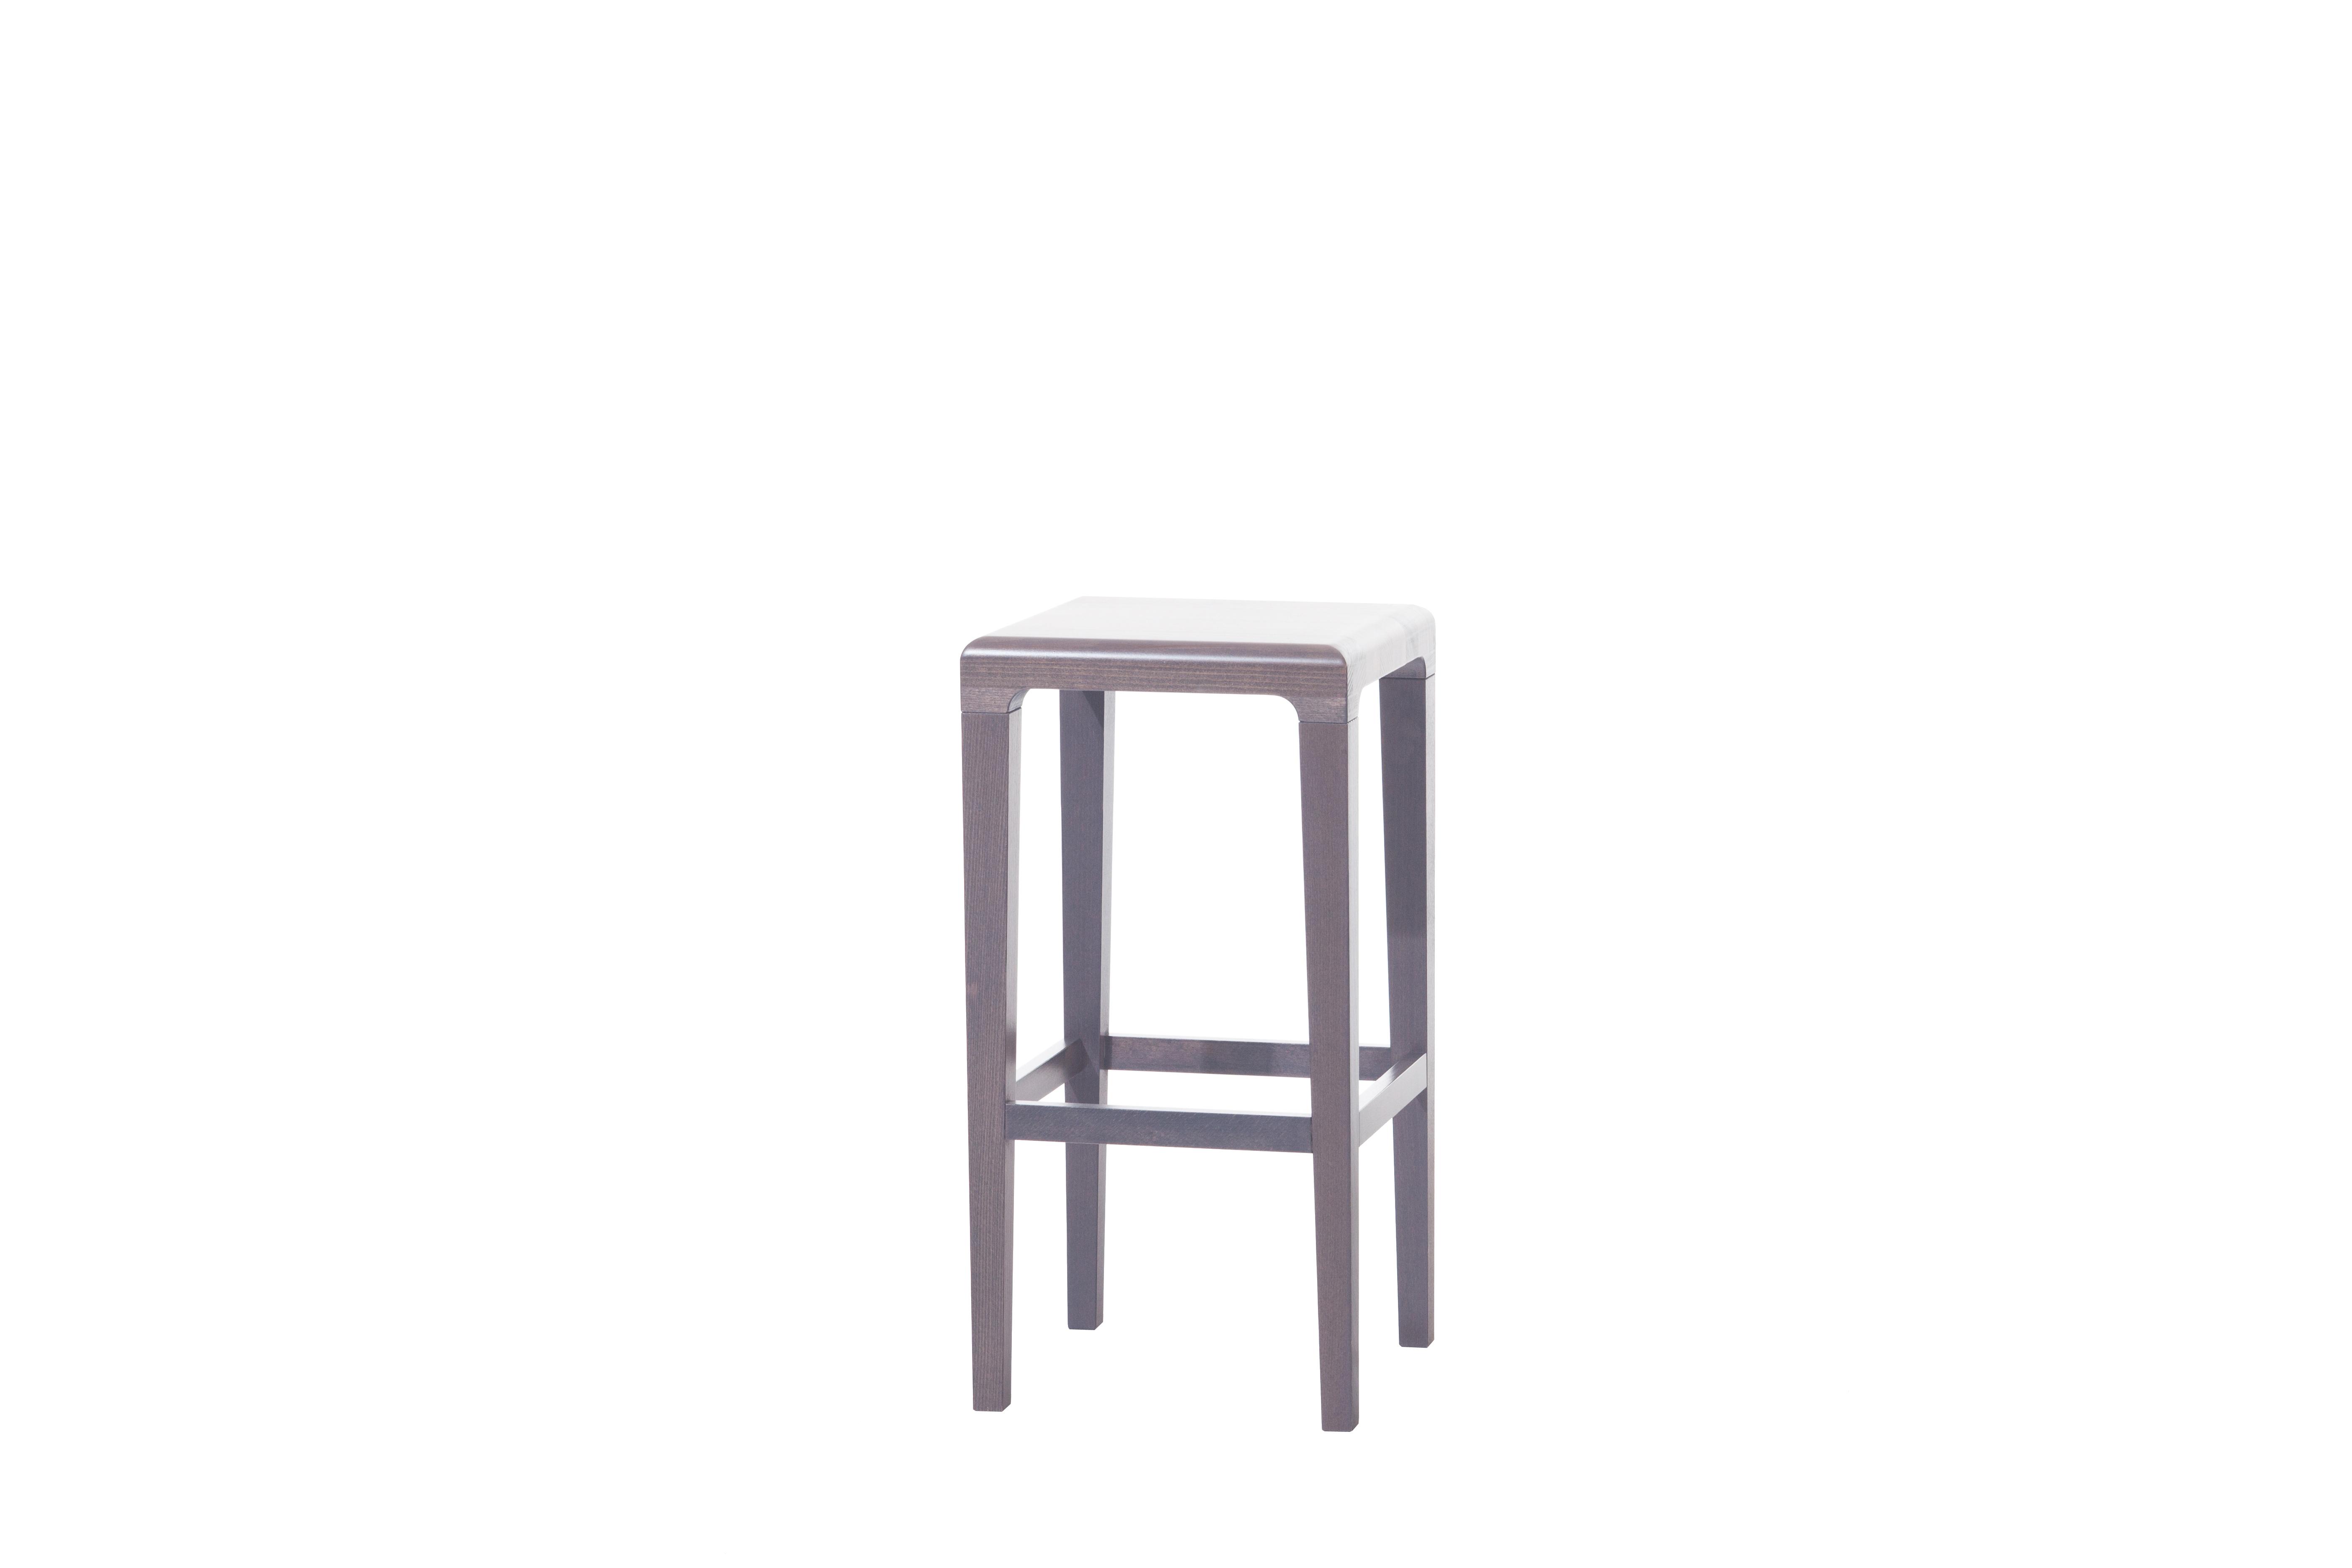 Scaun din lemn de stejar Rioja Grey Small, l32xA32xH64 cm